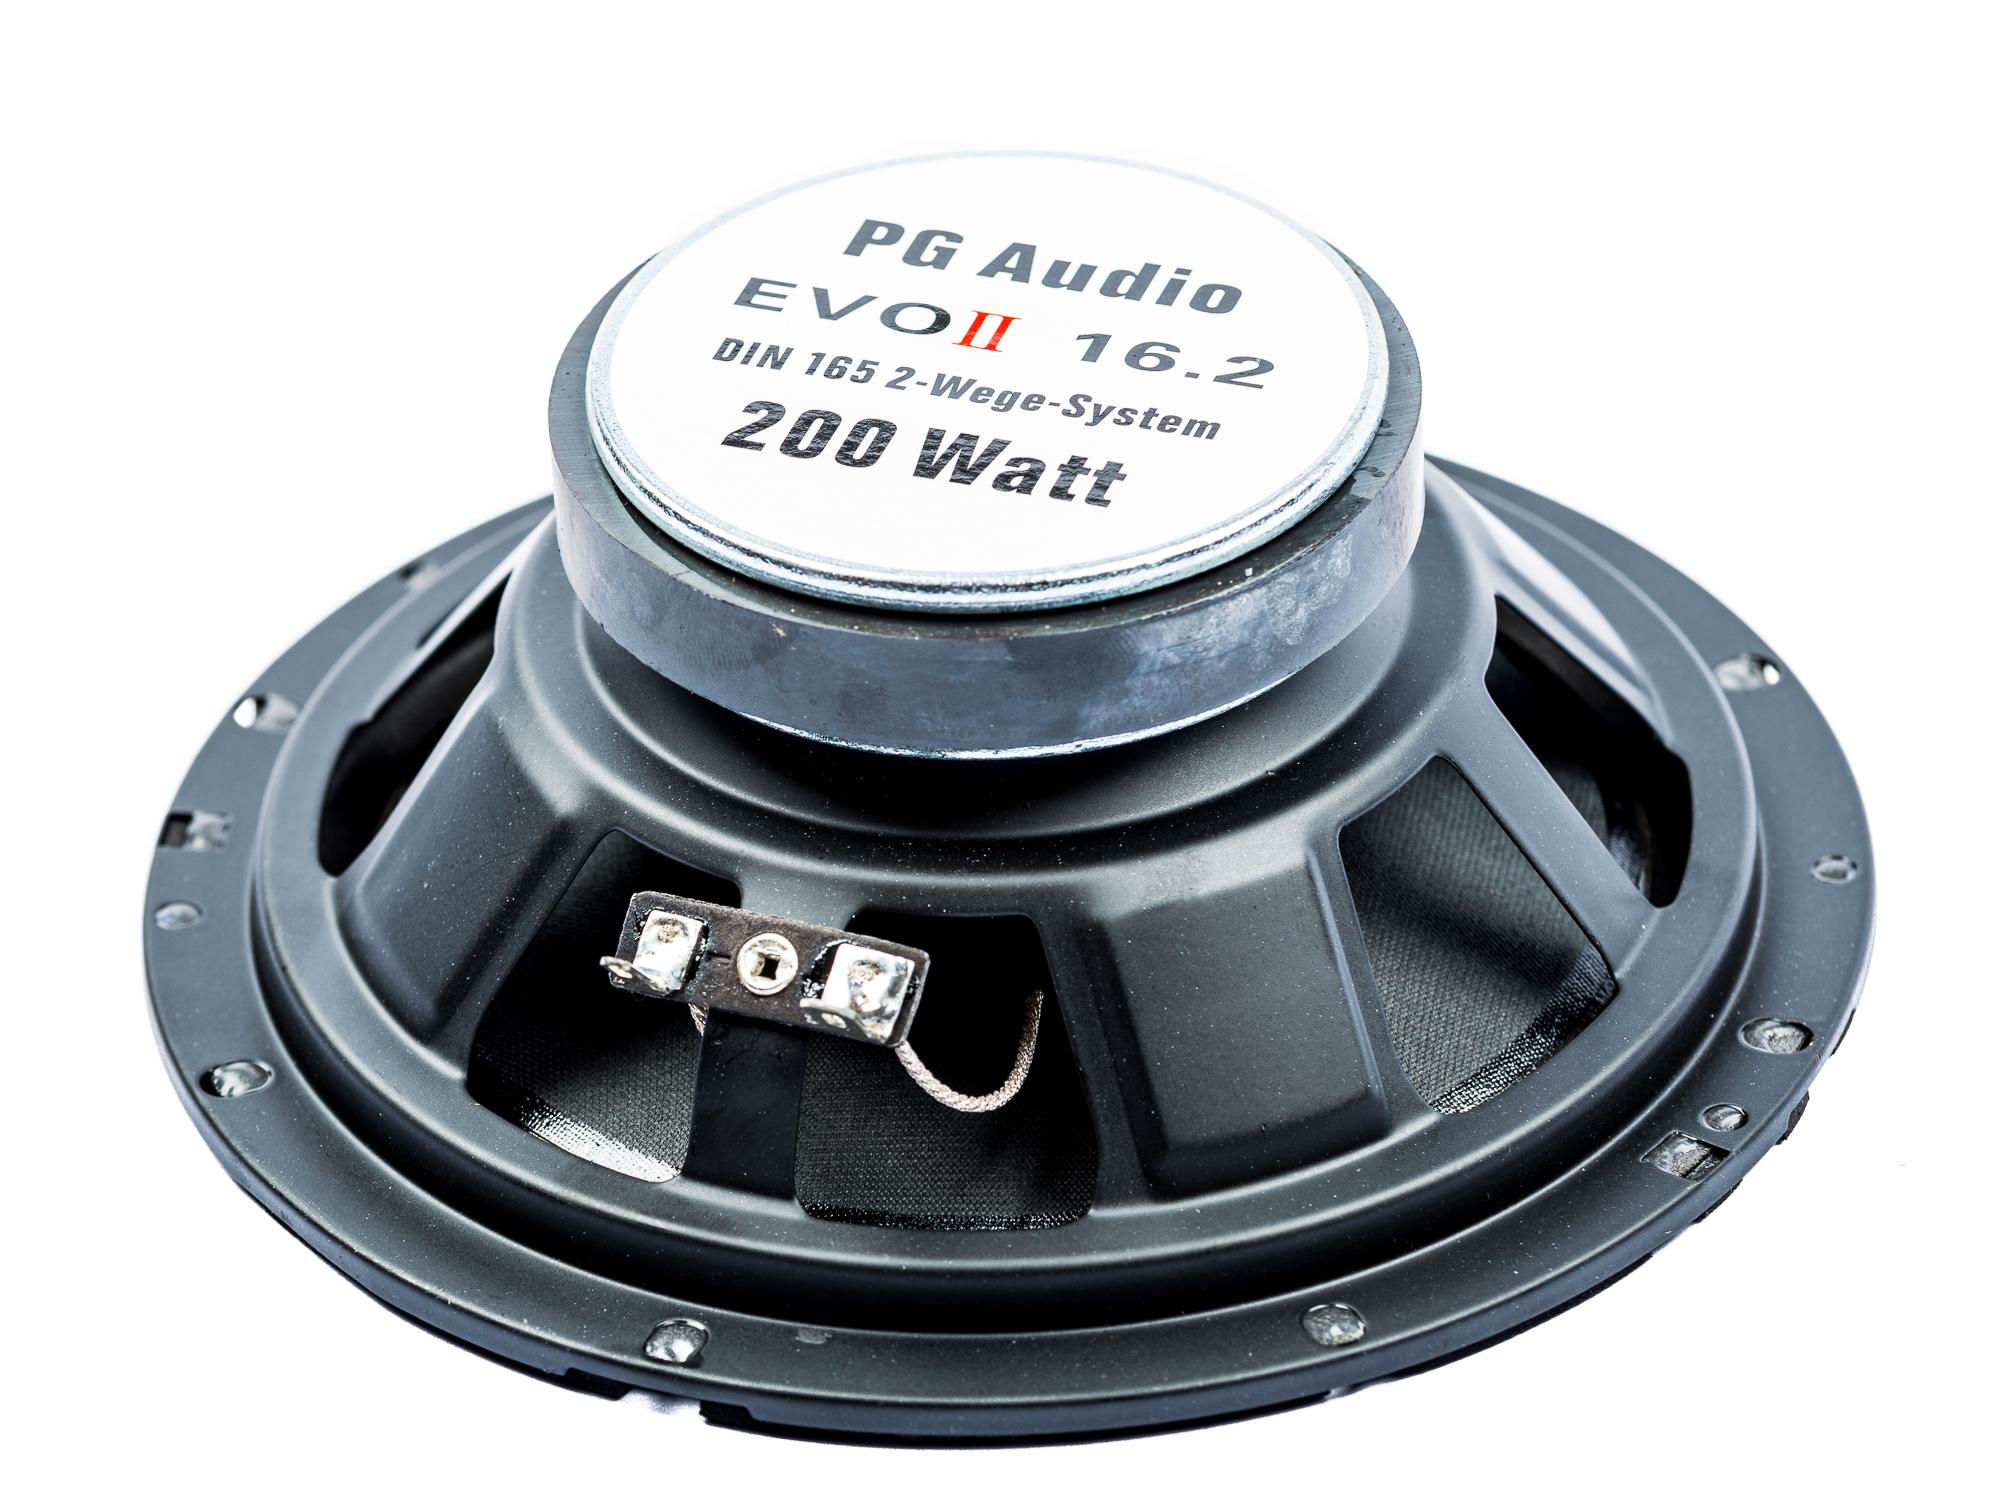 Ford Focus Fiesta Facelift Focus C-Max Kuga Lautsprecher Einbauset Tür vorne PG Audio – Bild 3